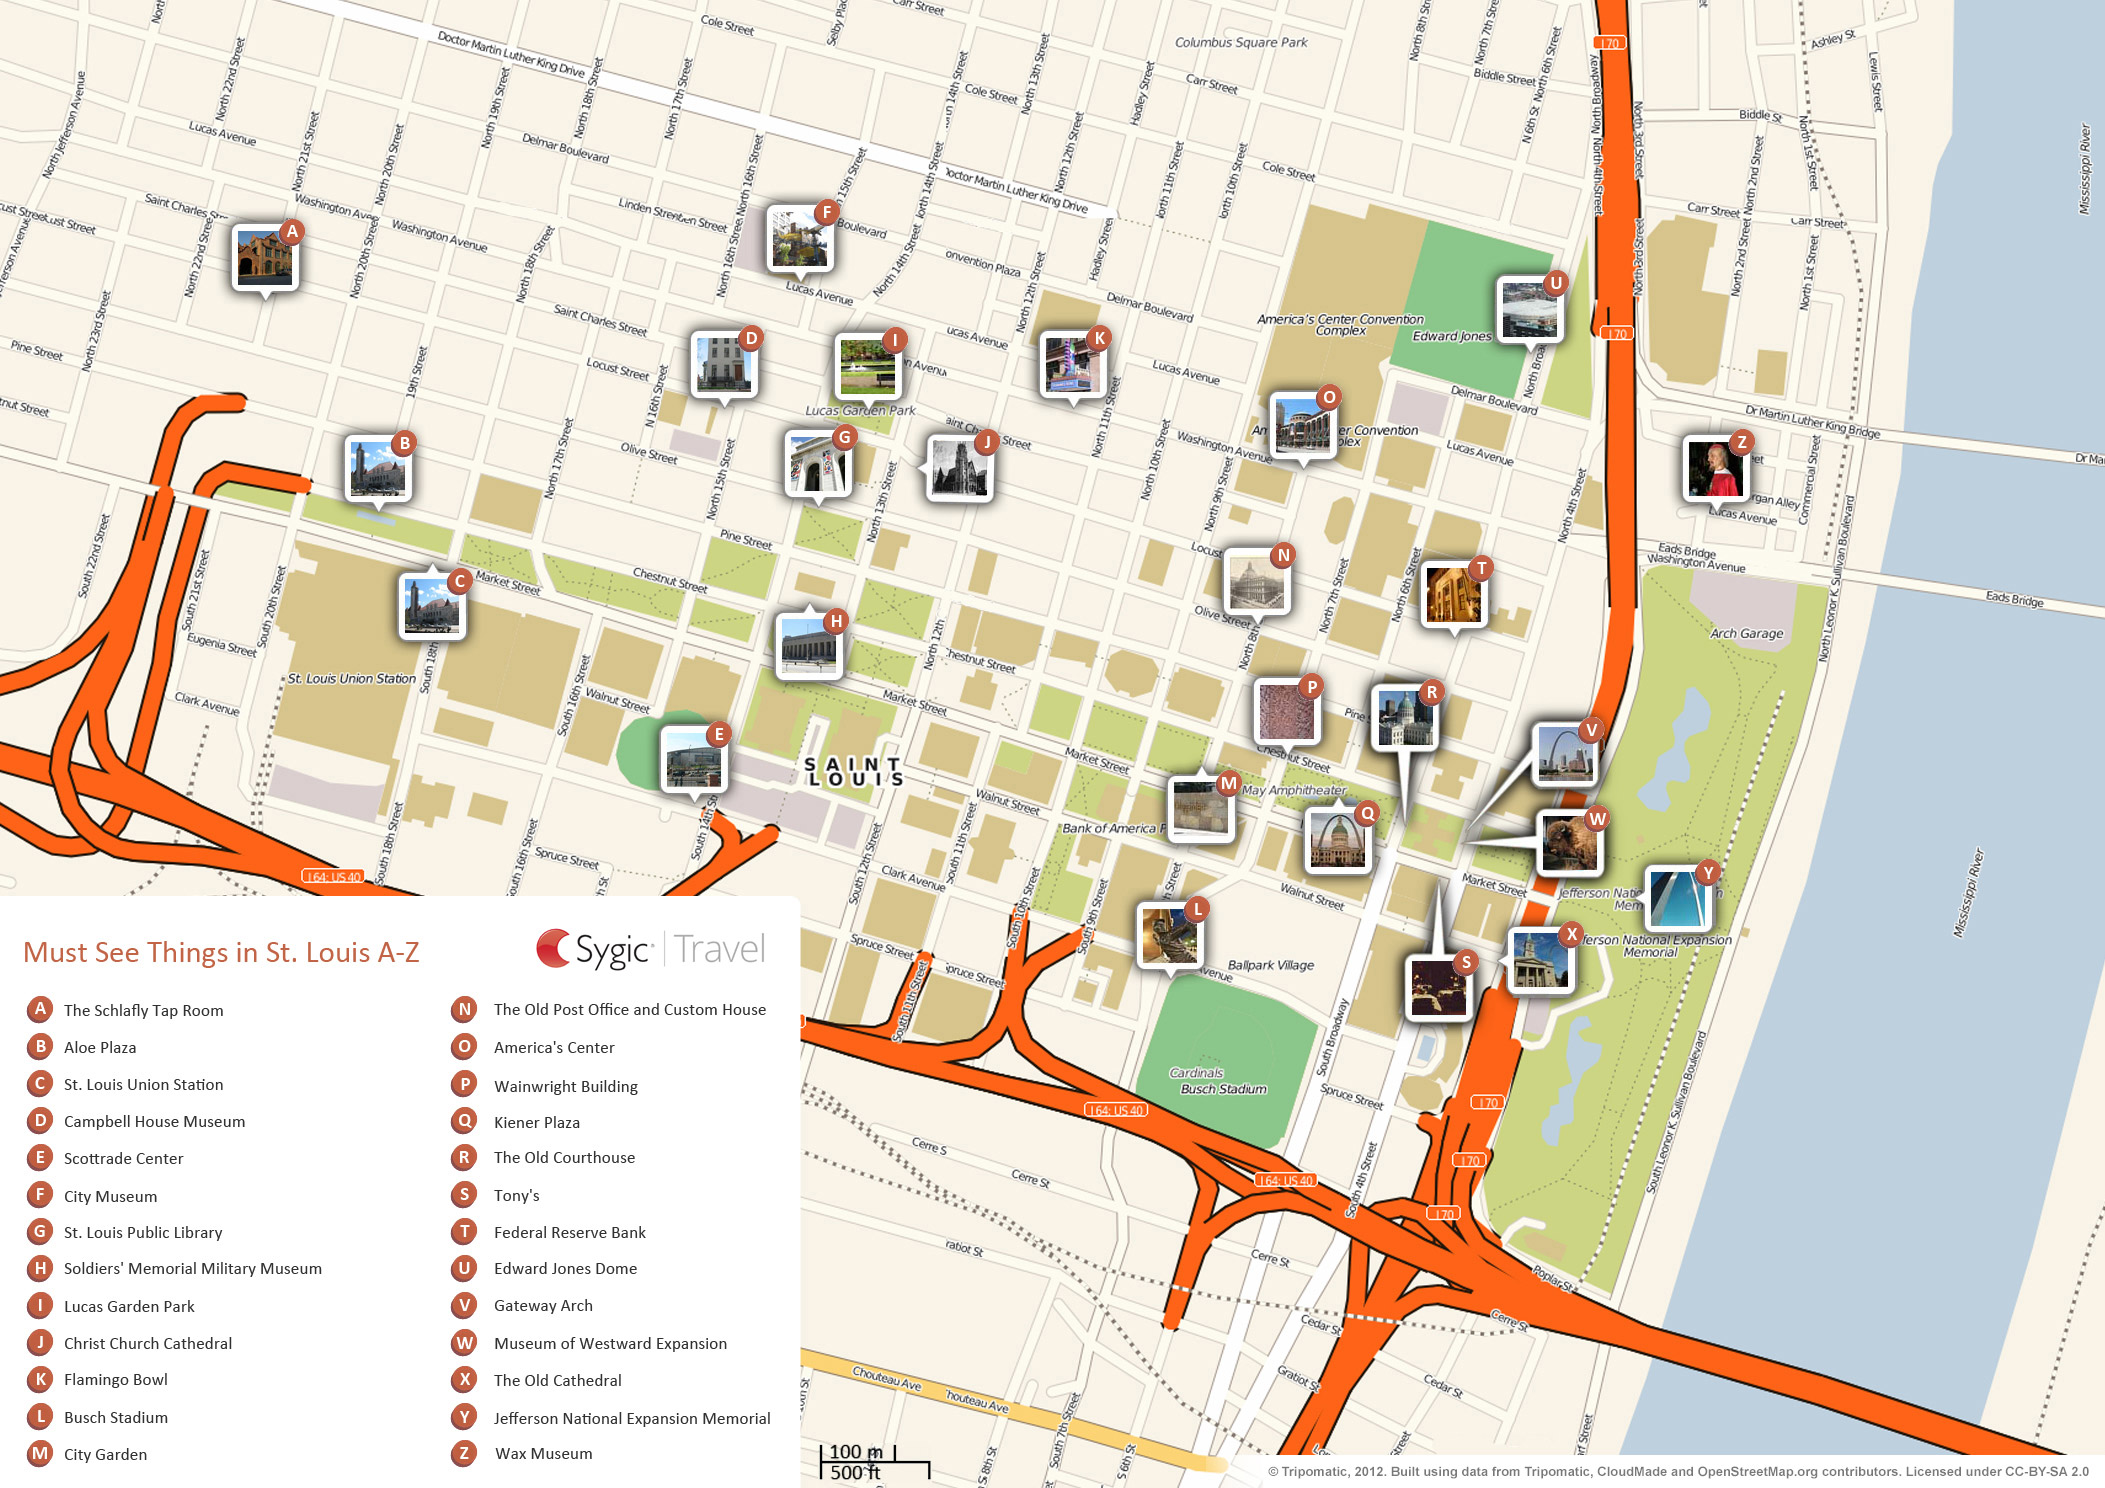 missouri botanical garden map bnhspinecom